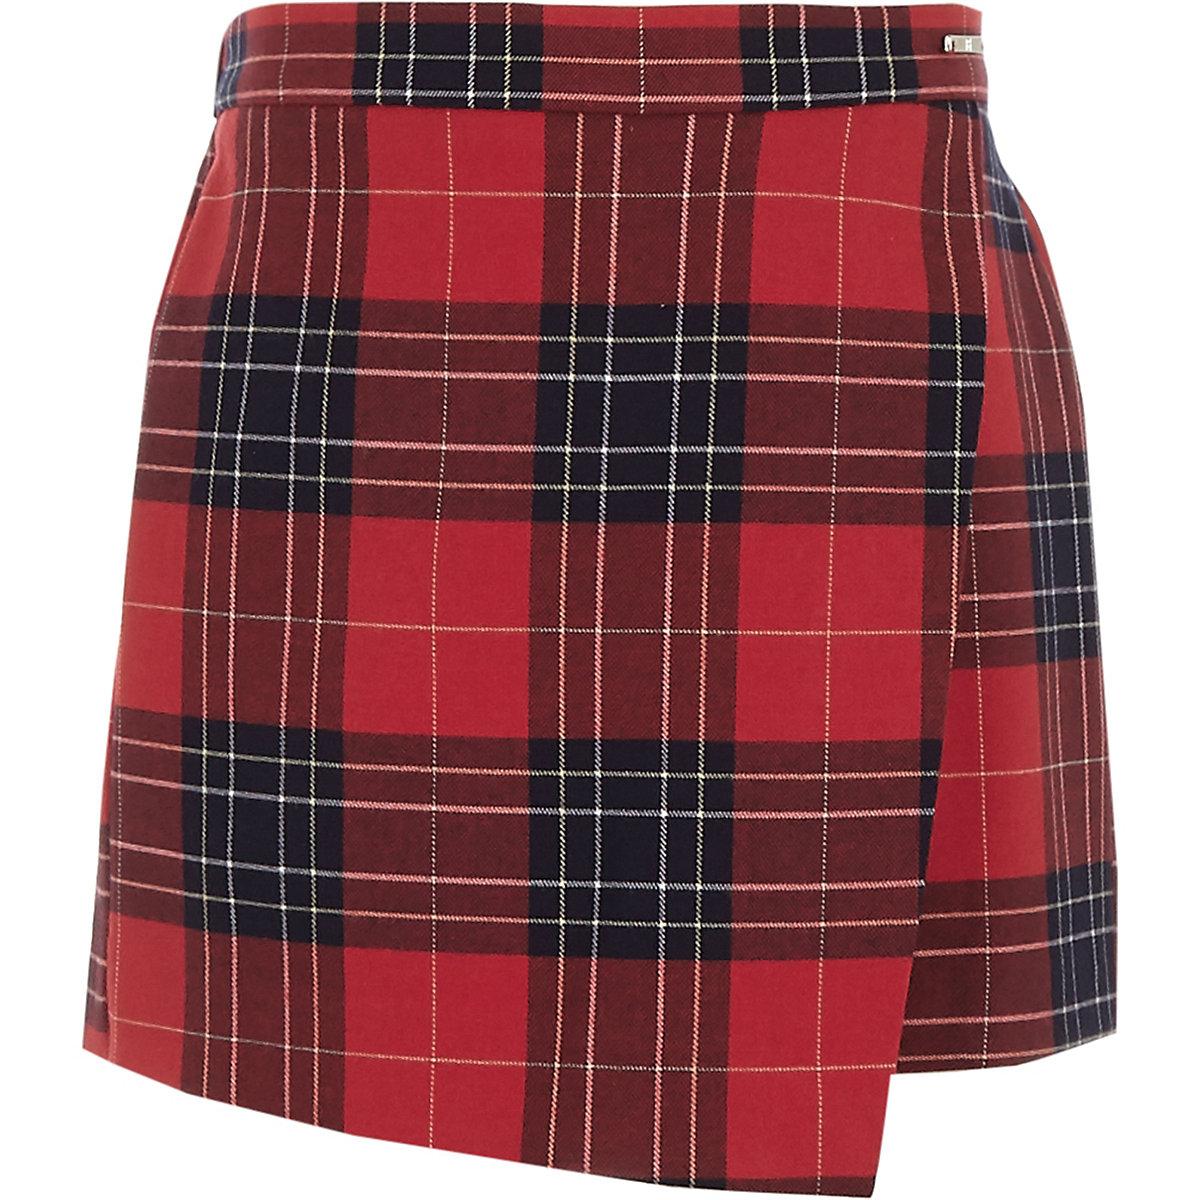 Girls red plaid skort